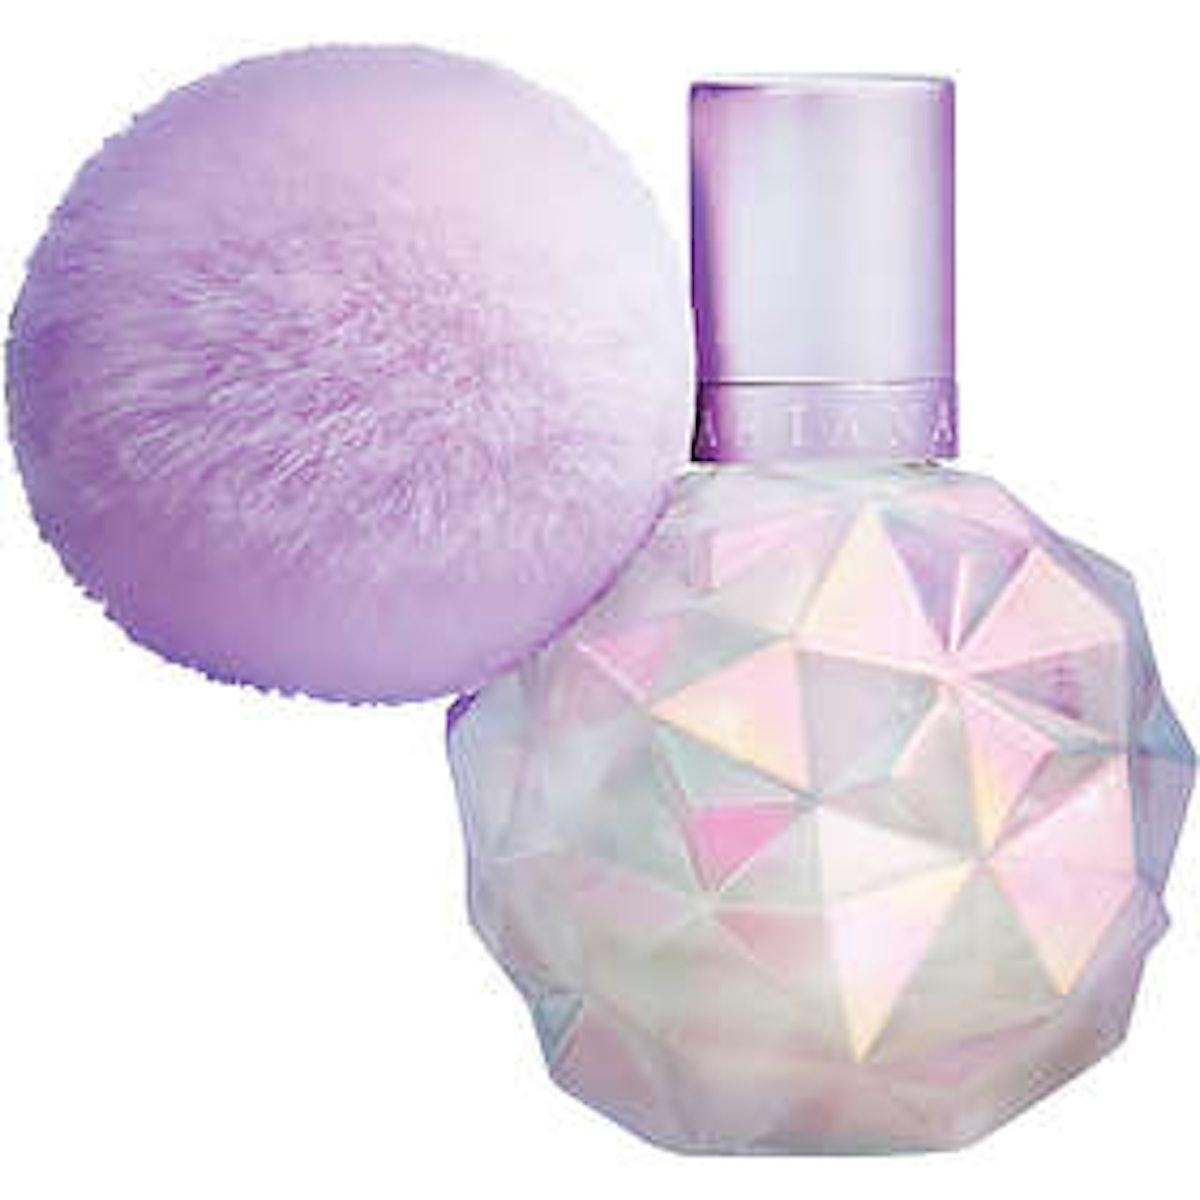 Moonlight Eau De Parfum